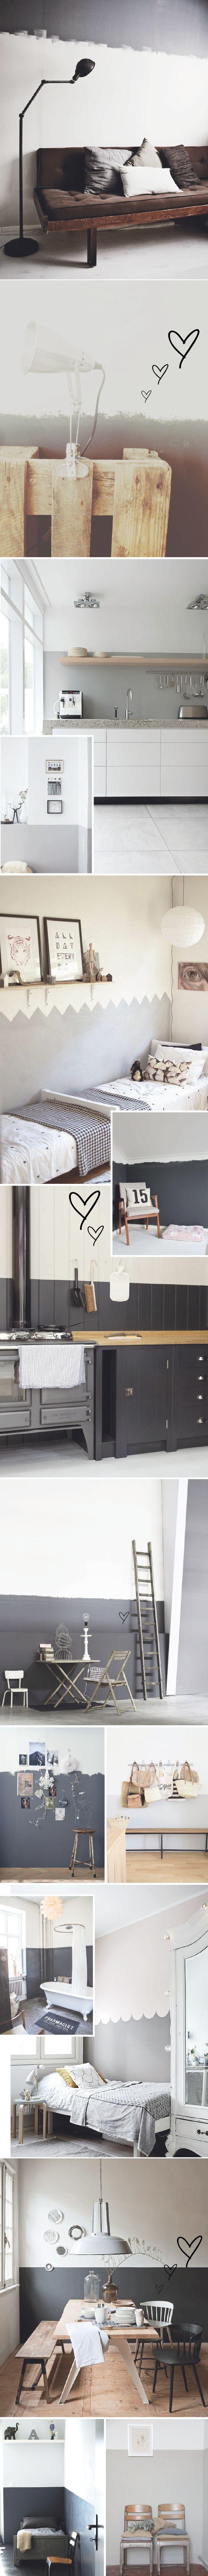 25 beste idee n over tiener speelkamer op pinterest tiener lounge tienerontmoetingsplaats - Wallpaper volwassen kamer trendy ...